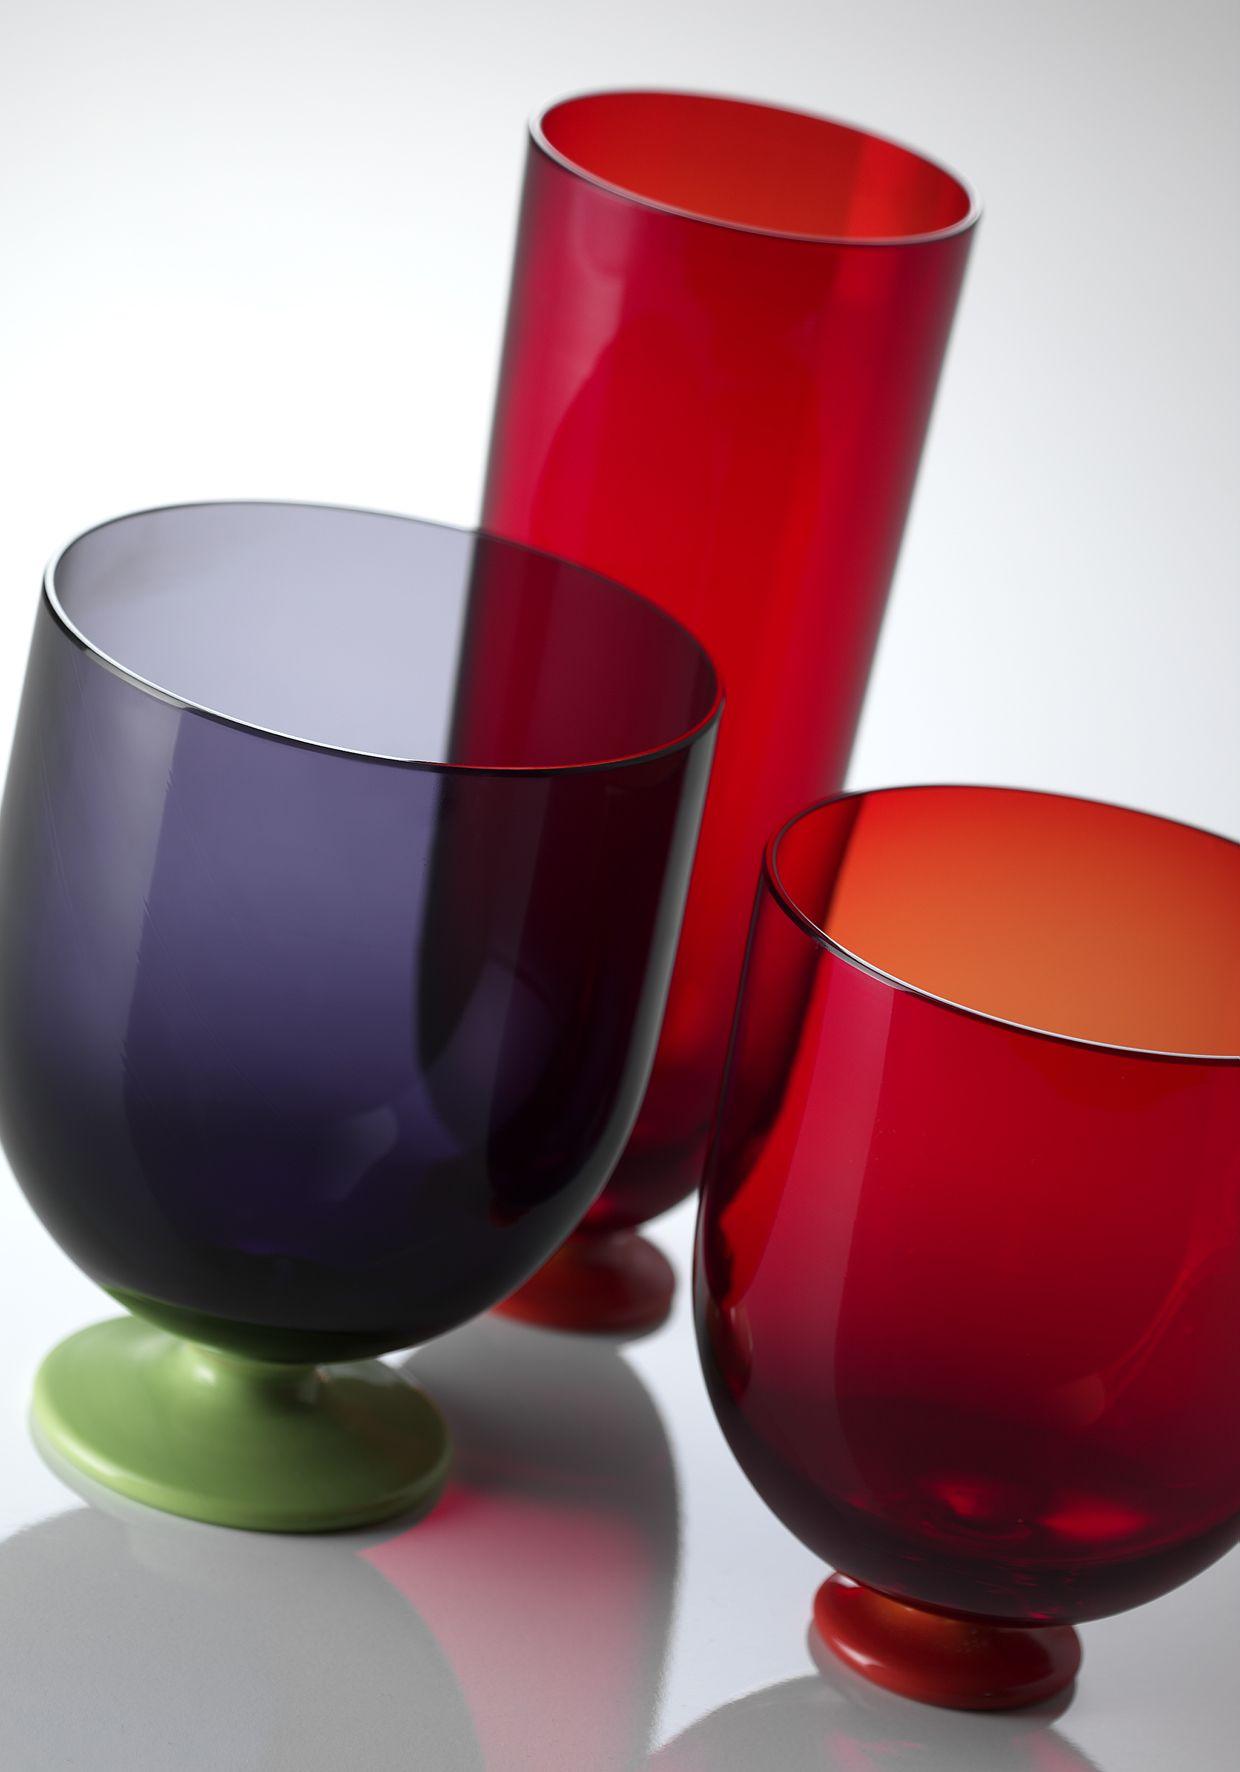 Idra Murano Glass Tumbler Green W 2019 Products Murano Glass Tableware I Tumbler